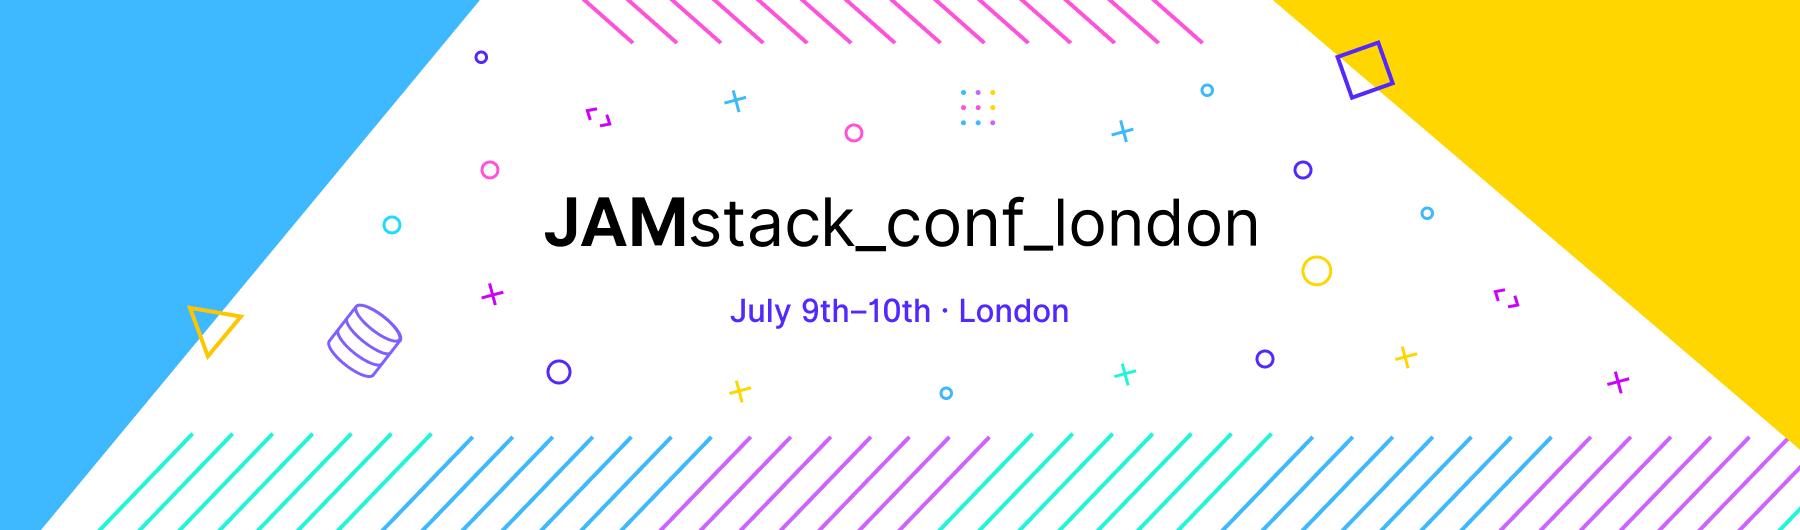 JAMstack_conf_london 2019